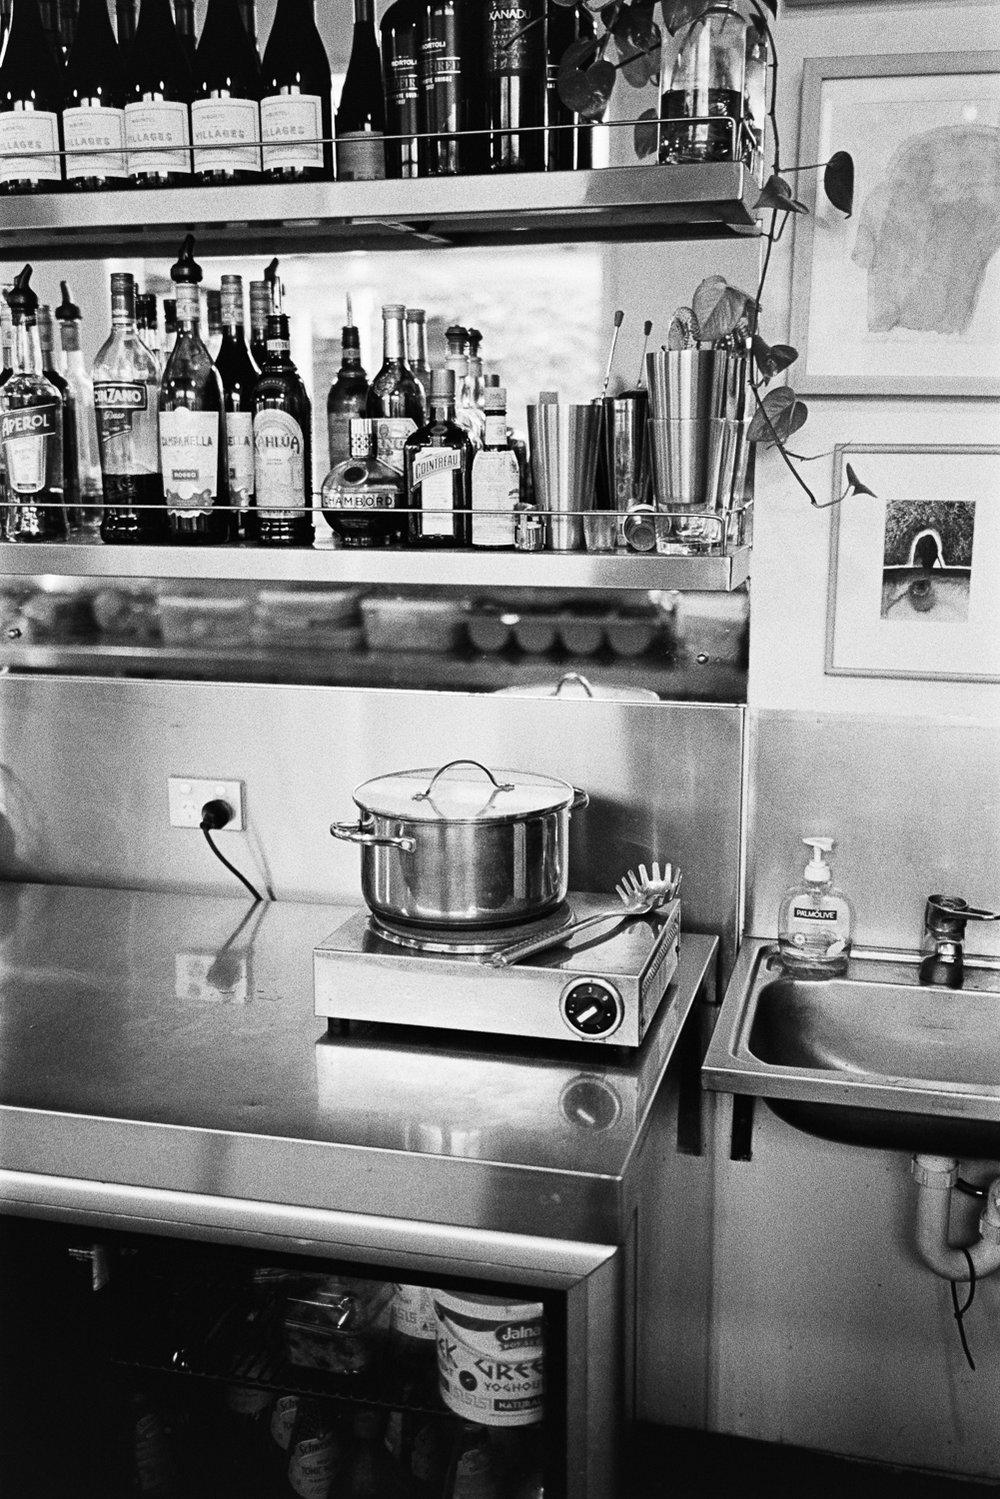 Still lifes at Jamie's Espresso Bar.